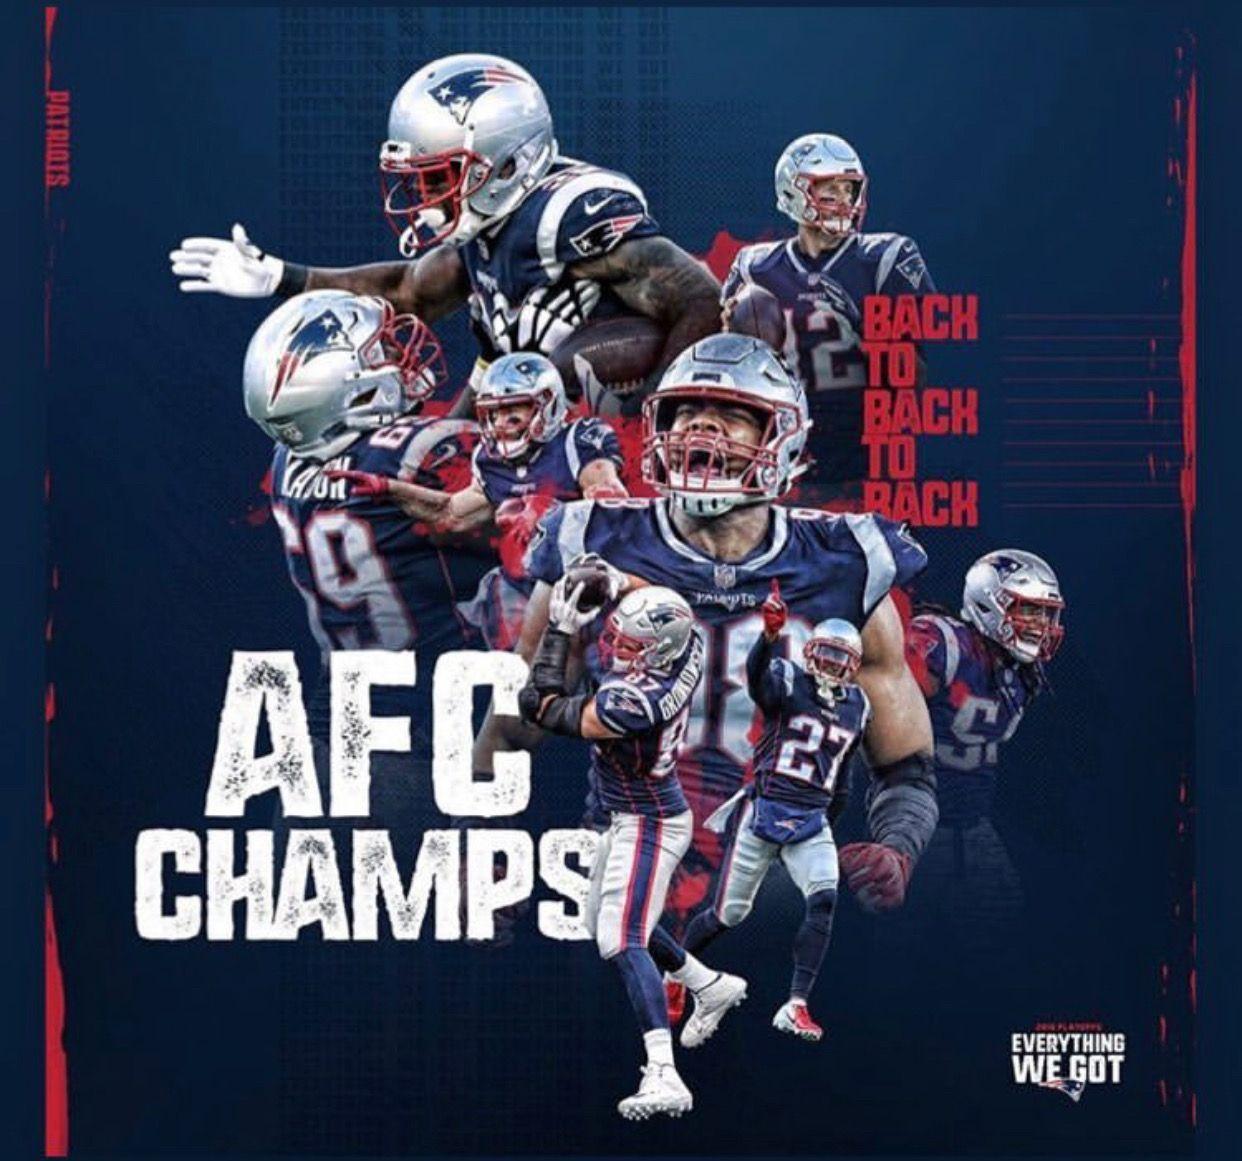 New England Patriots Kansas City Chiefs Afc Championship Betagainstus Everythingw New England Patriots Patriots Cheerleaders New England Patriots Football